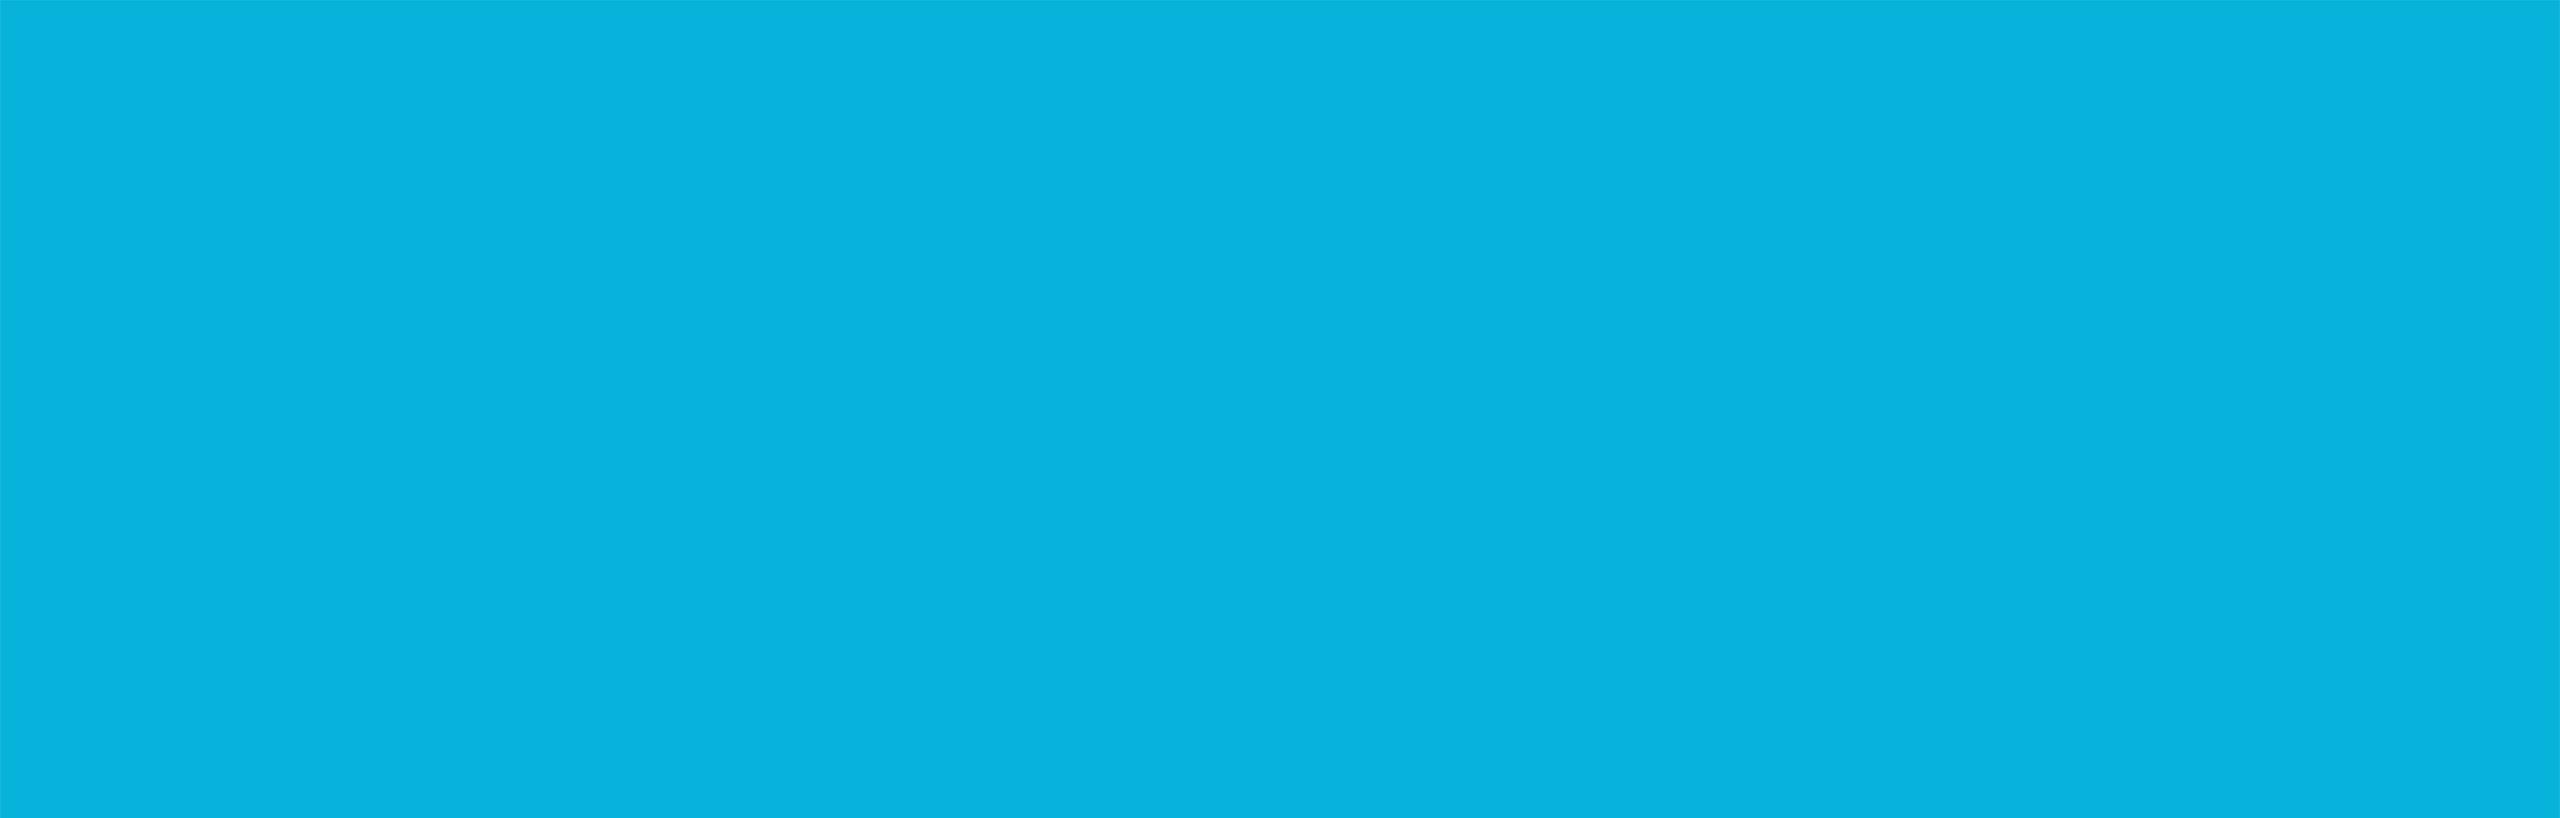 fondo_azul